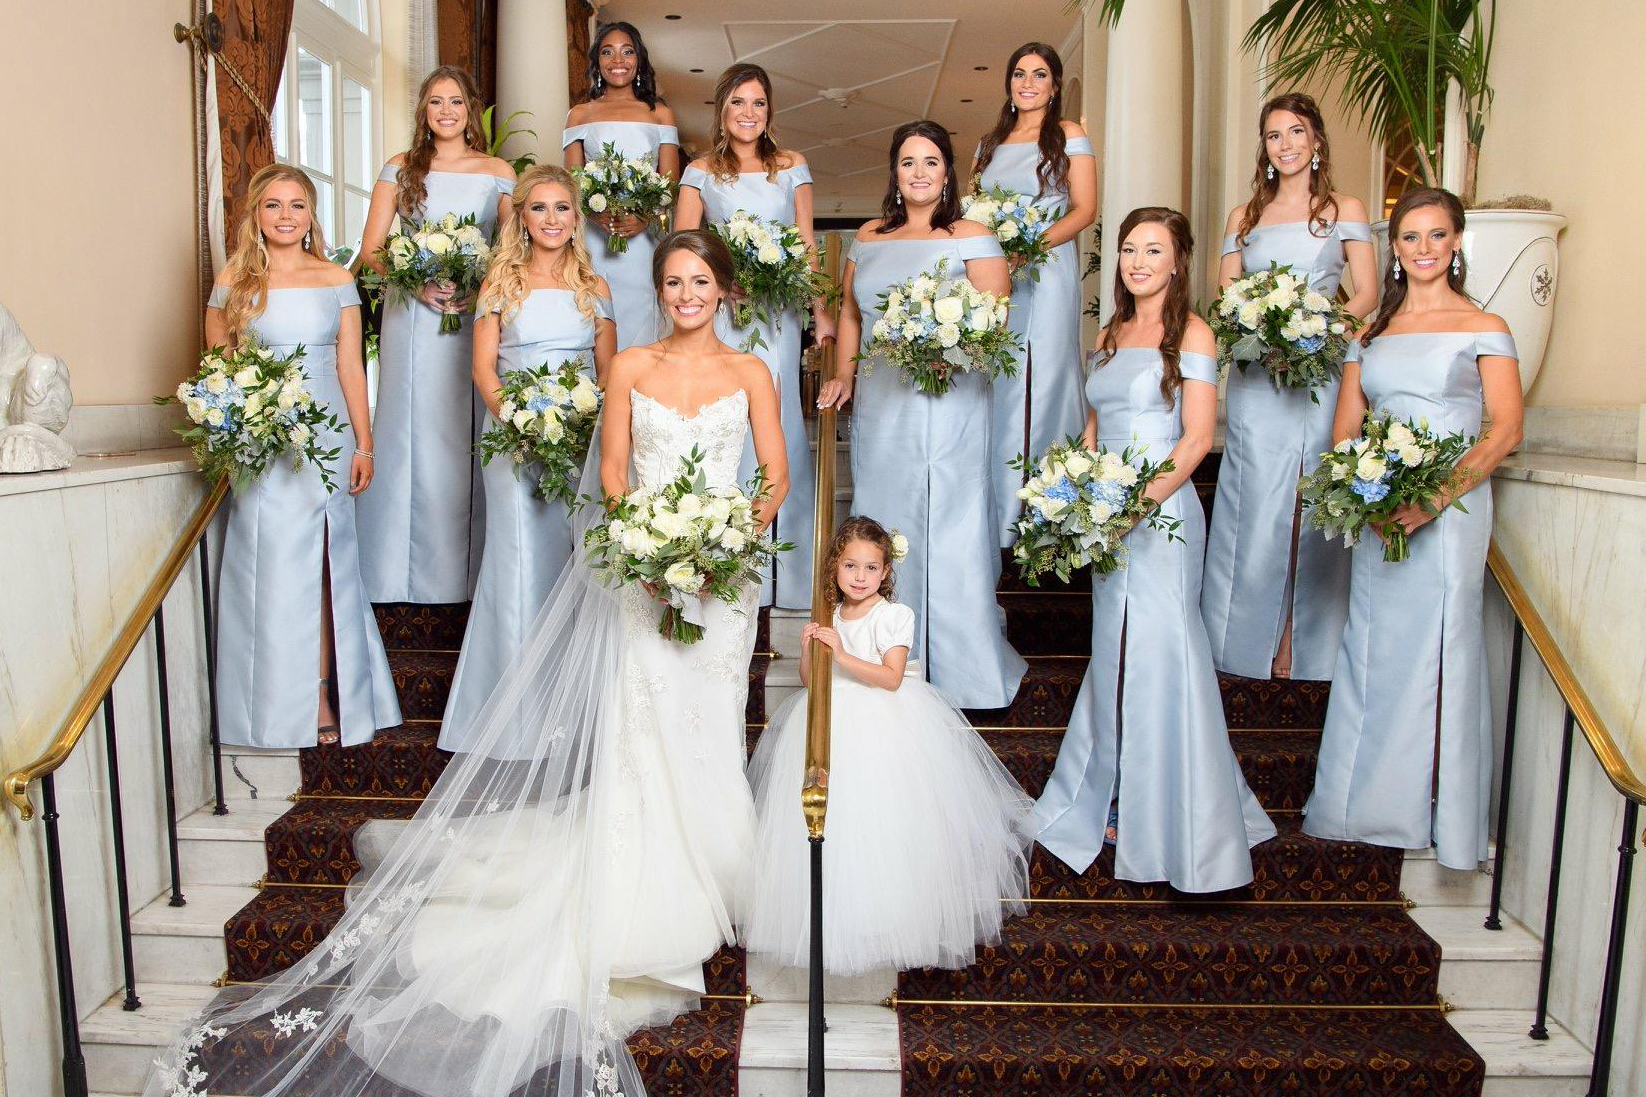 6 Things to Consider When Shopping for Flower Girl Dresses